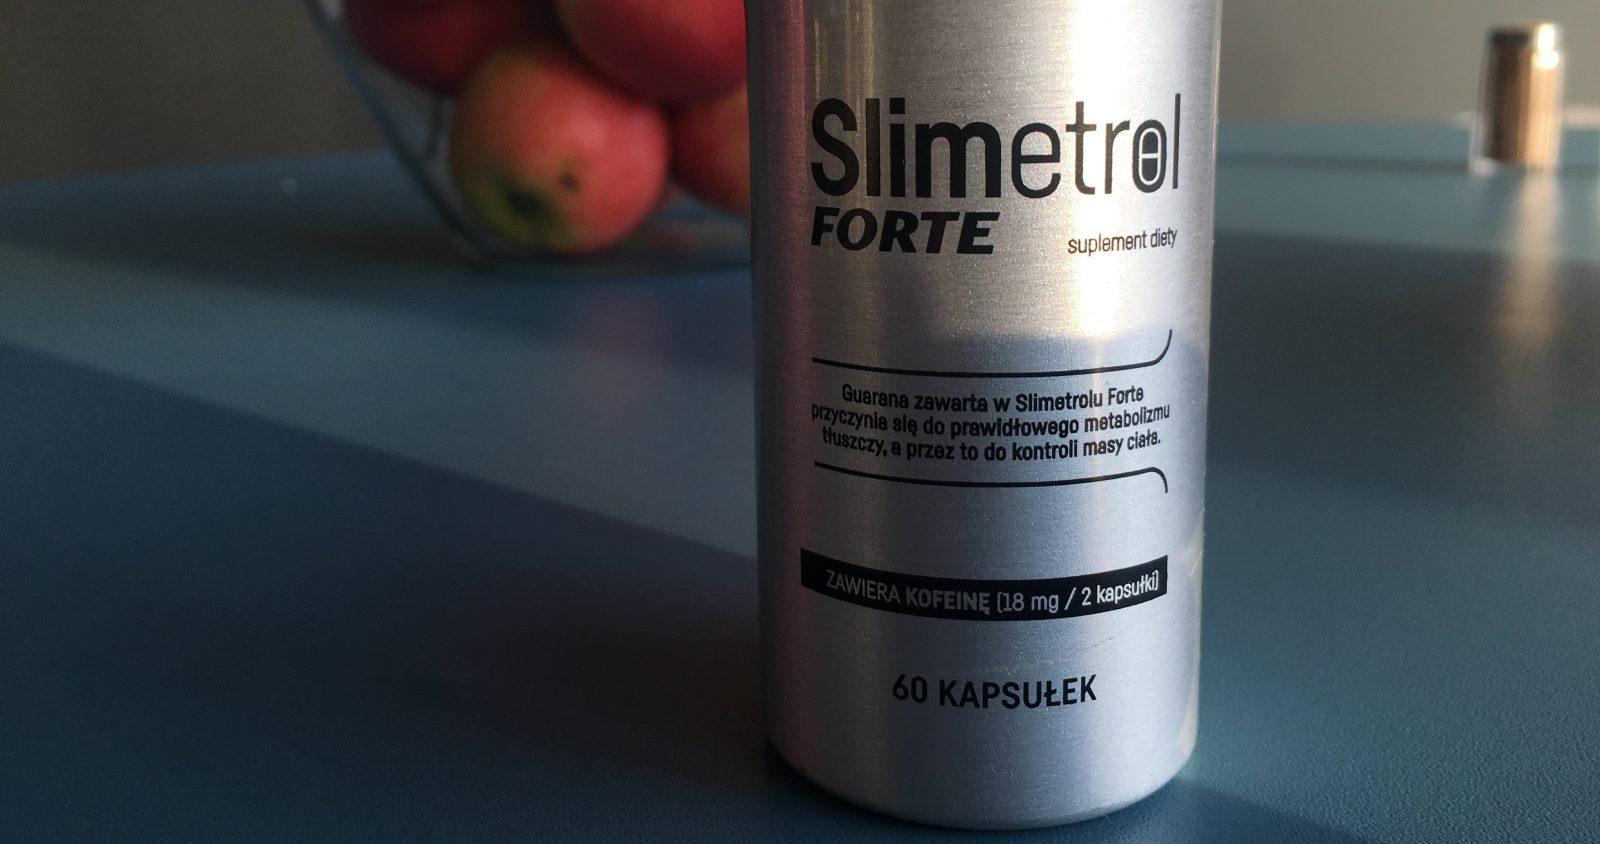 Opinie o Slimetrol Forte